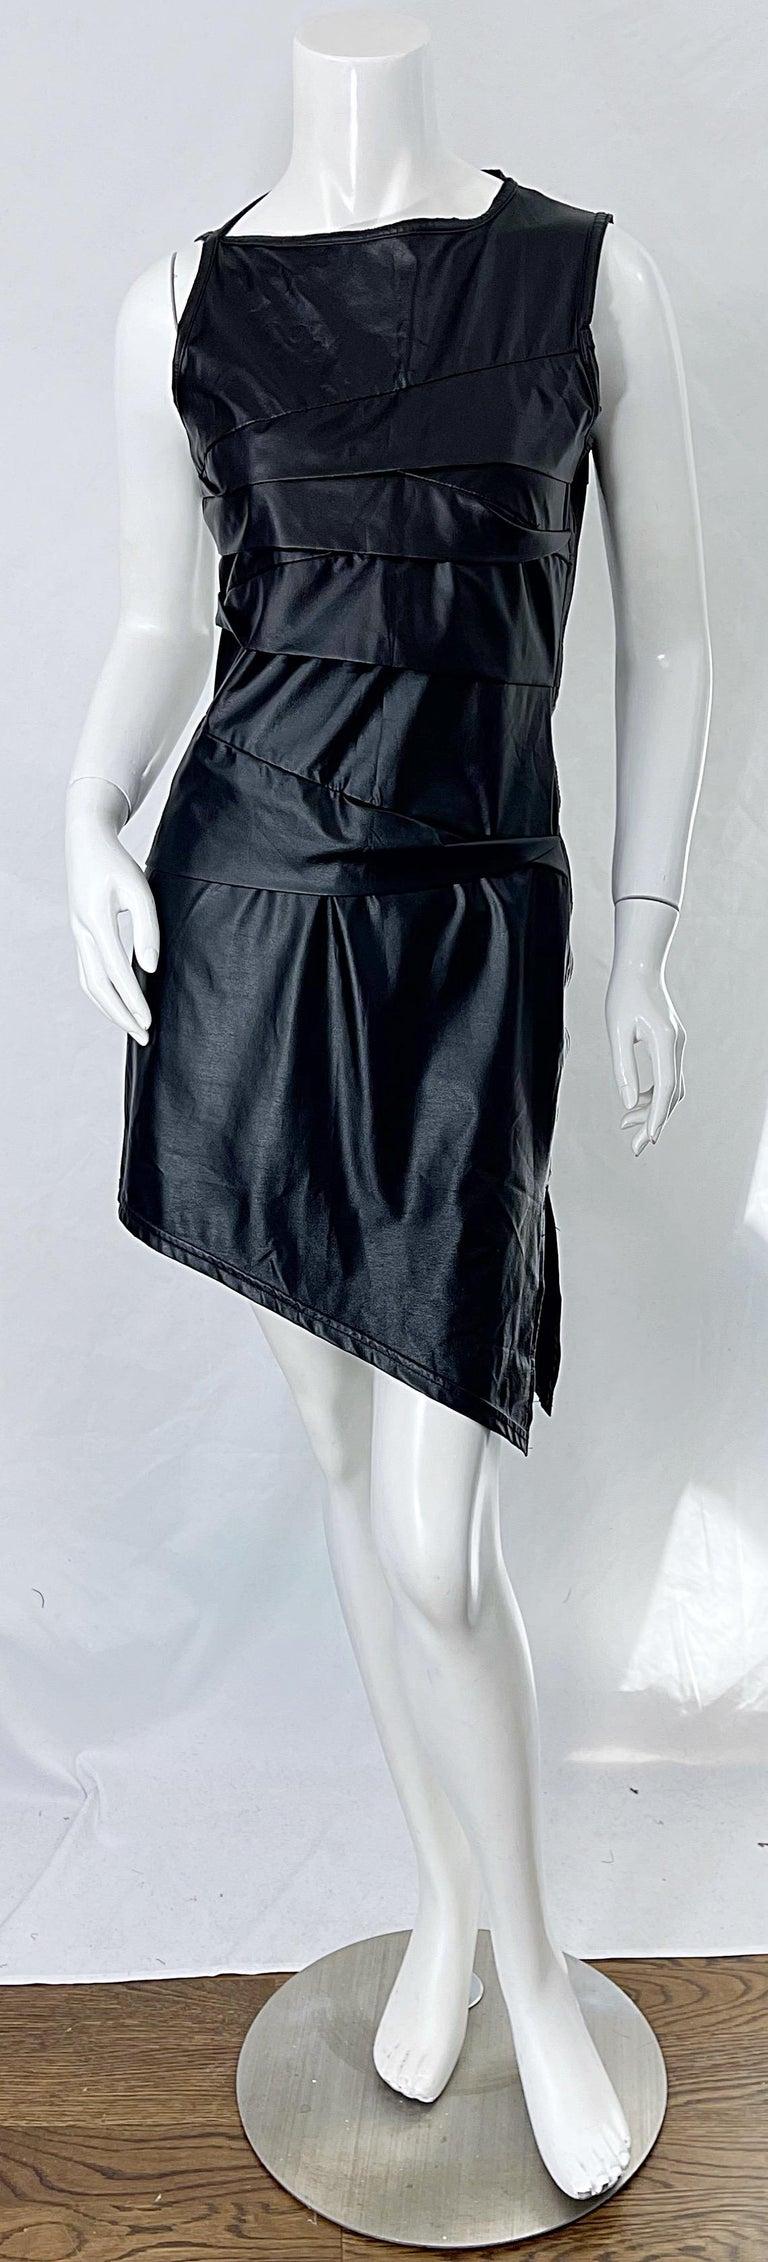 1990s Dexter Wong Club Kid Rave Japanese Black Pleather Vintage 90s Mini Dress For Sale 10